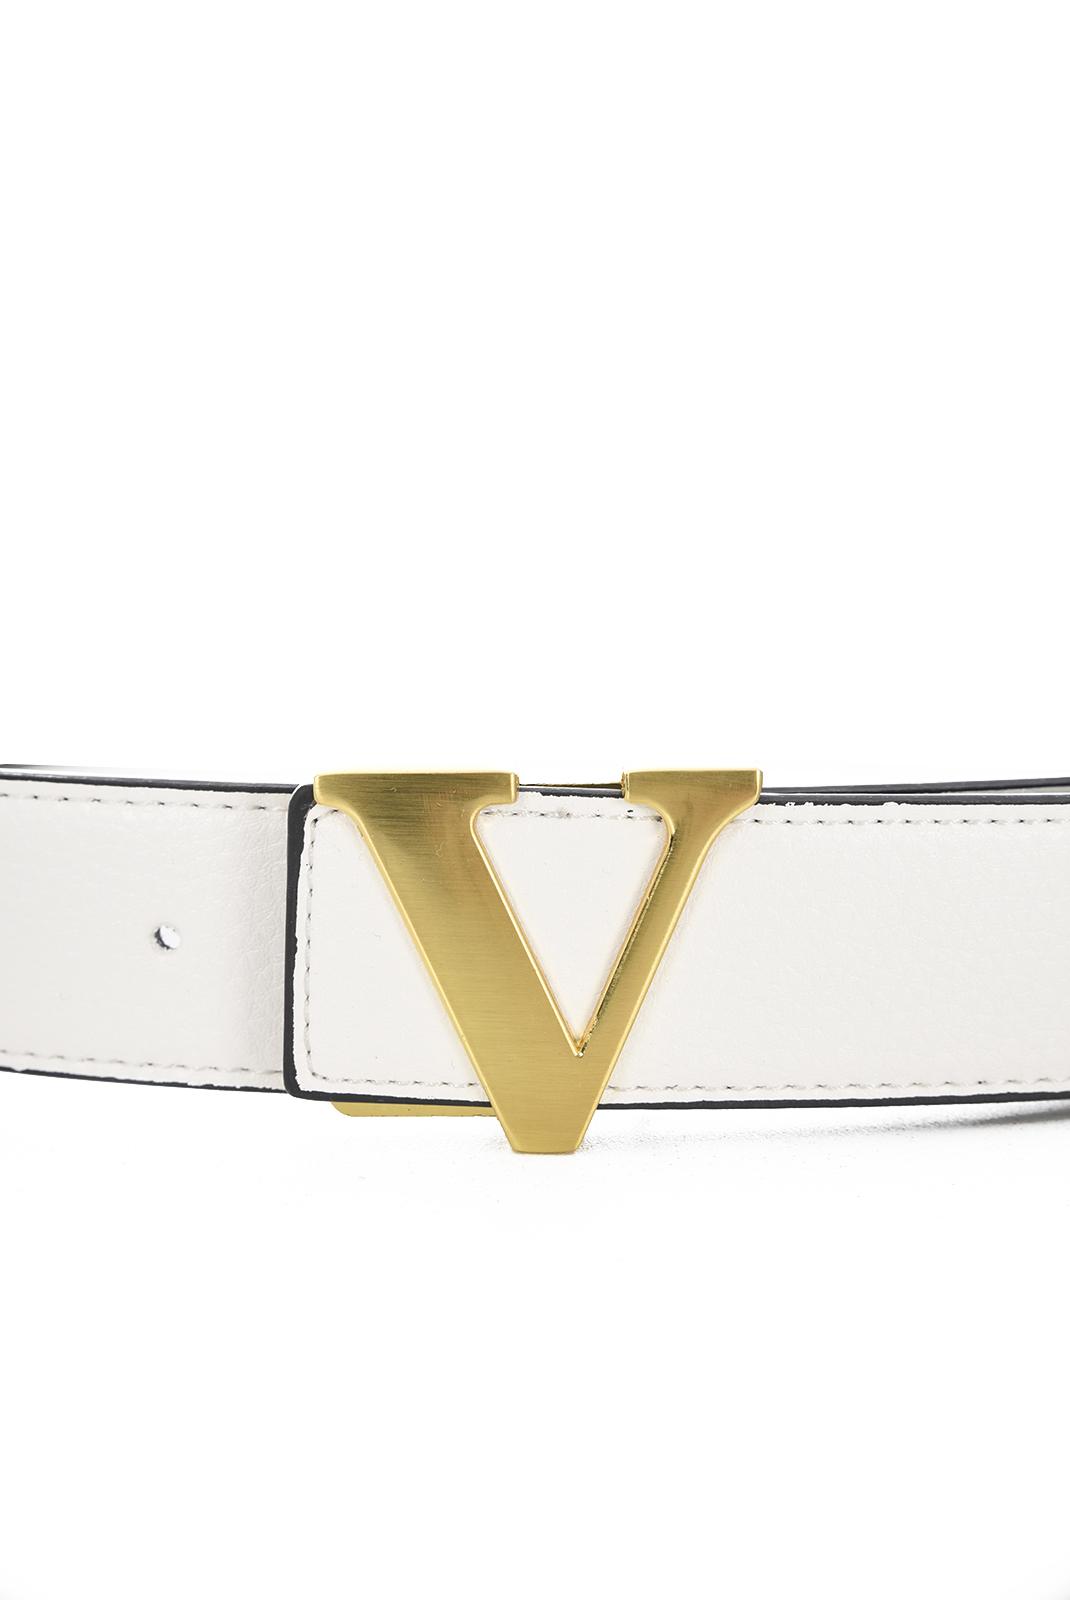 Ceintures  V1969 by Versace 1969 BIELLA GOLD BLANC